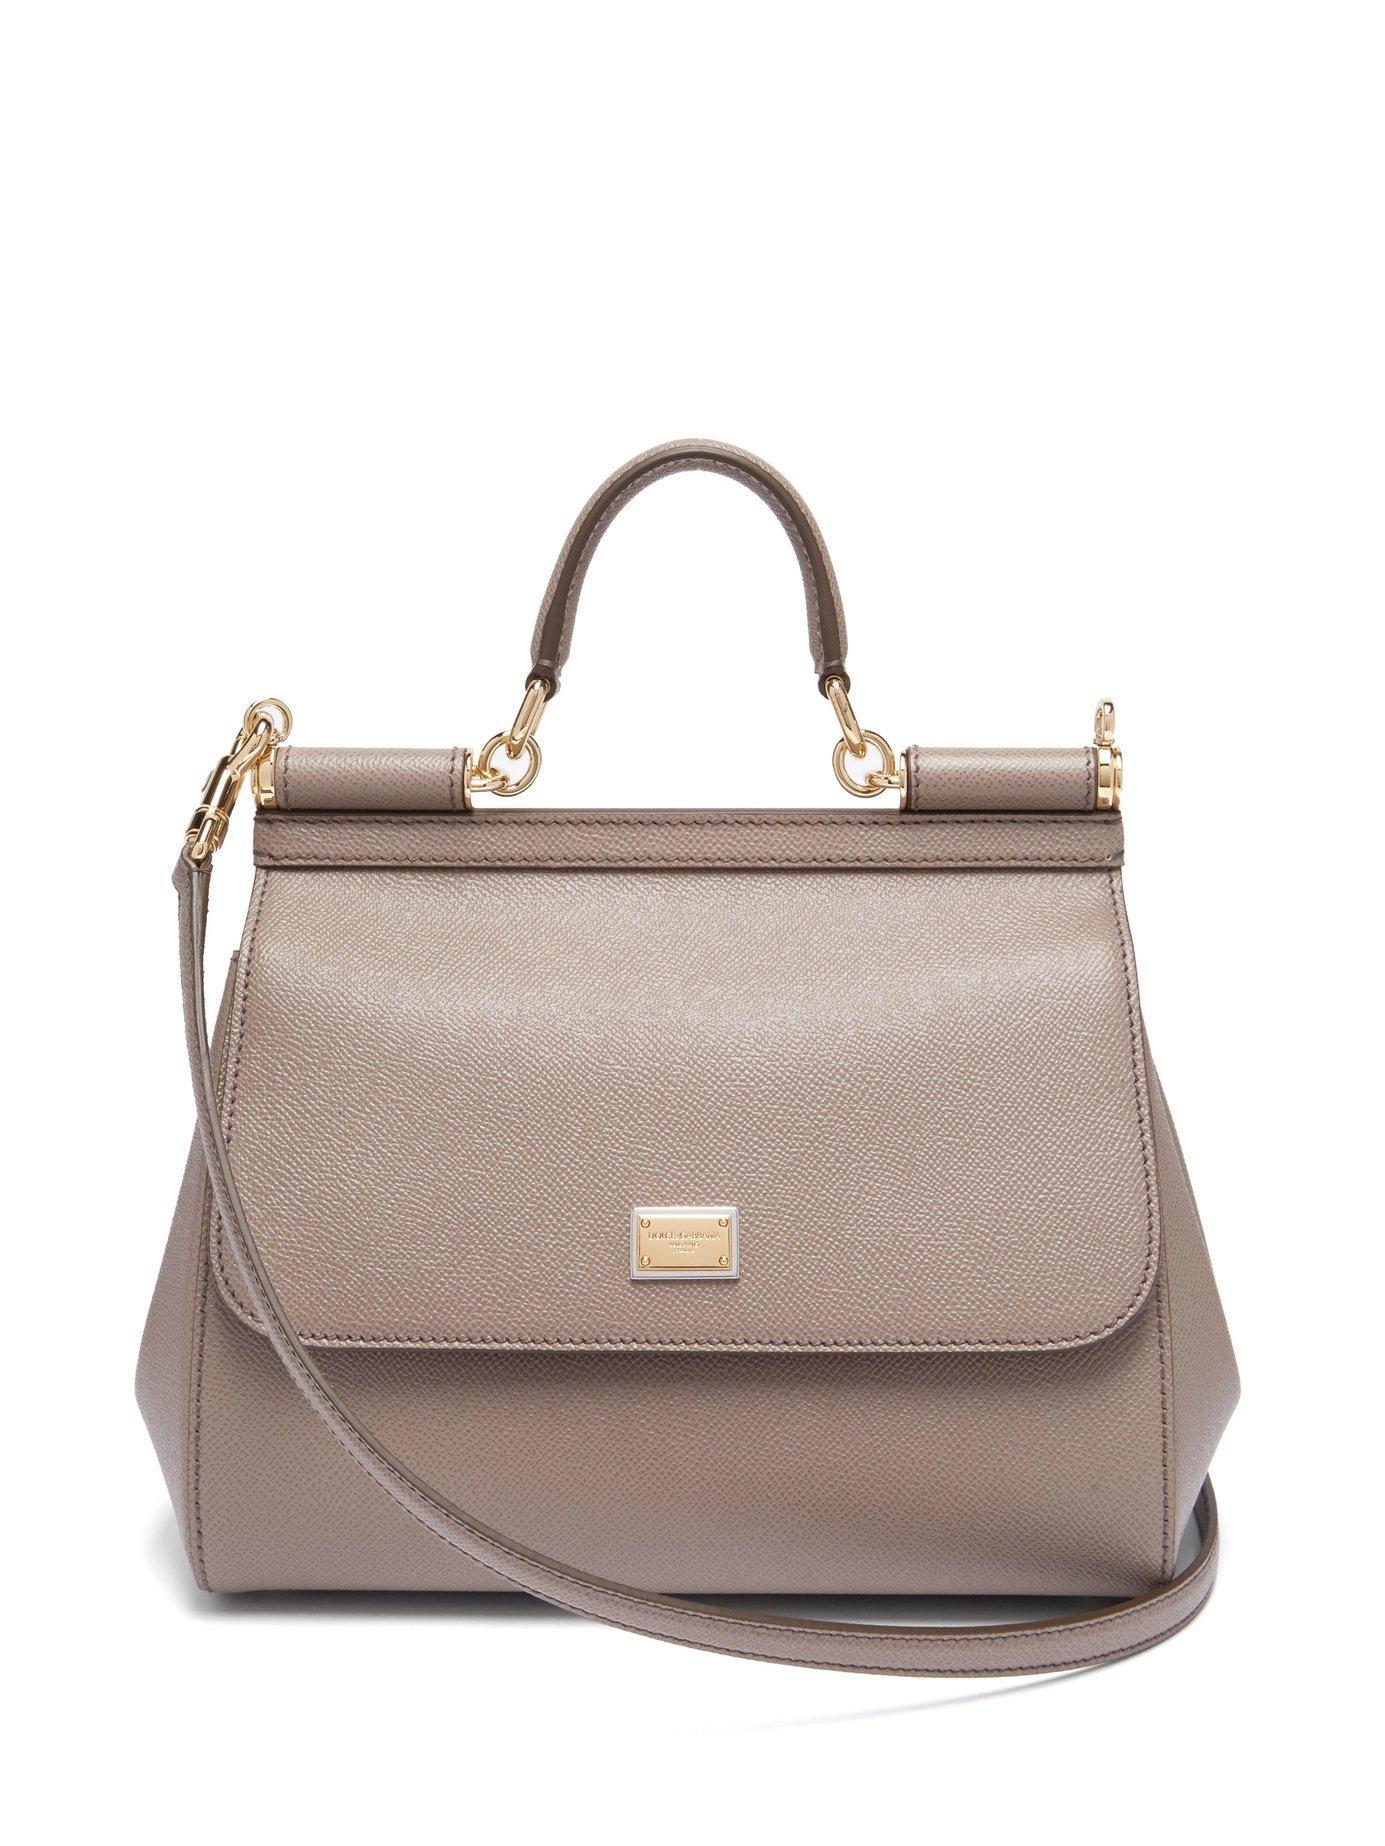 3304cb9d9b48 Lyst - Dolce   Gabbana Sicily Medium Dauphine Leather Bag in Gray